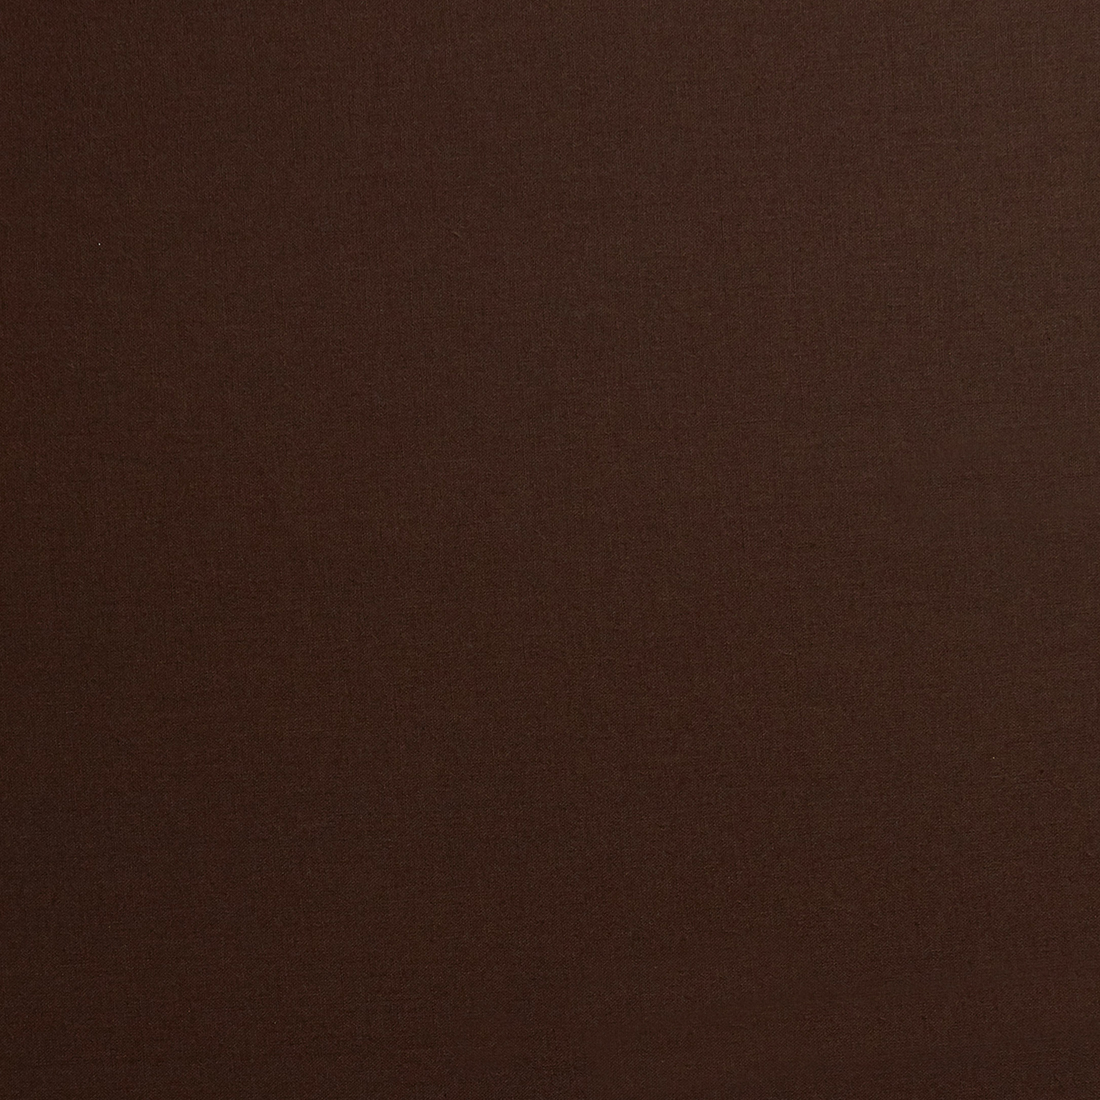 Craft Cotton Chocolate Fabric